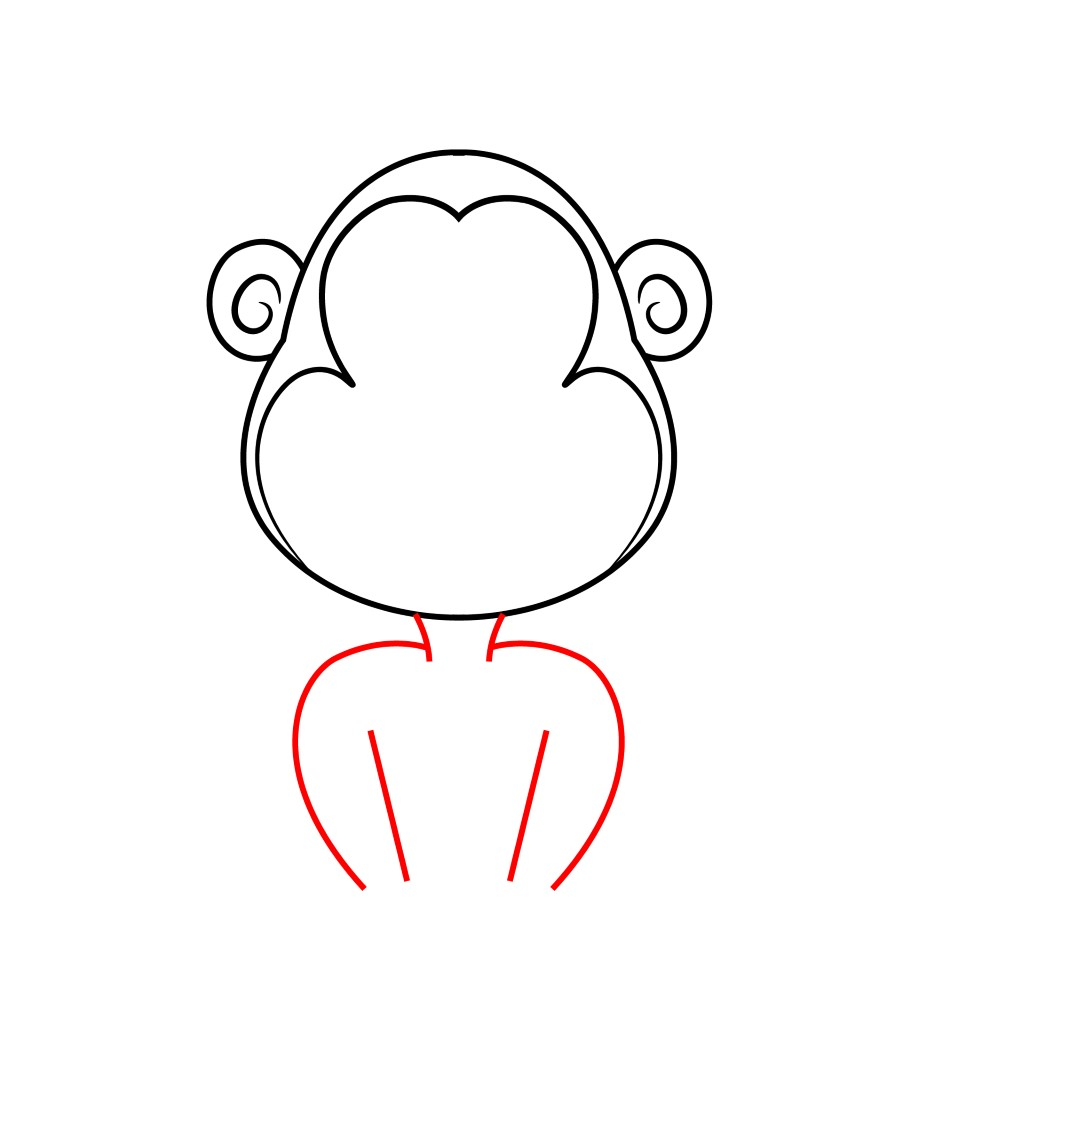 How To Draw A Cartoon Monkey - Draw Central